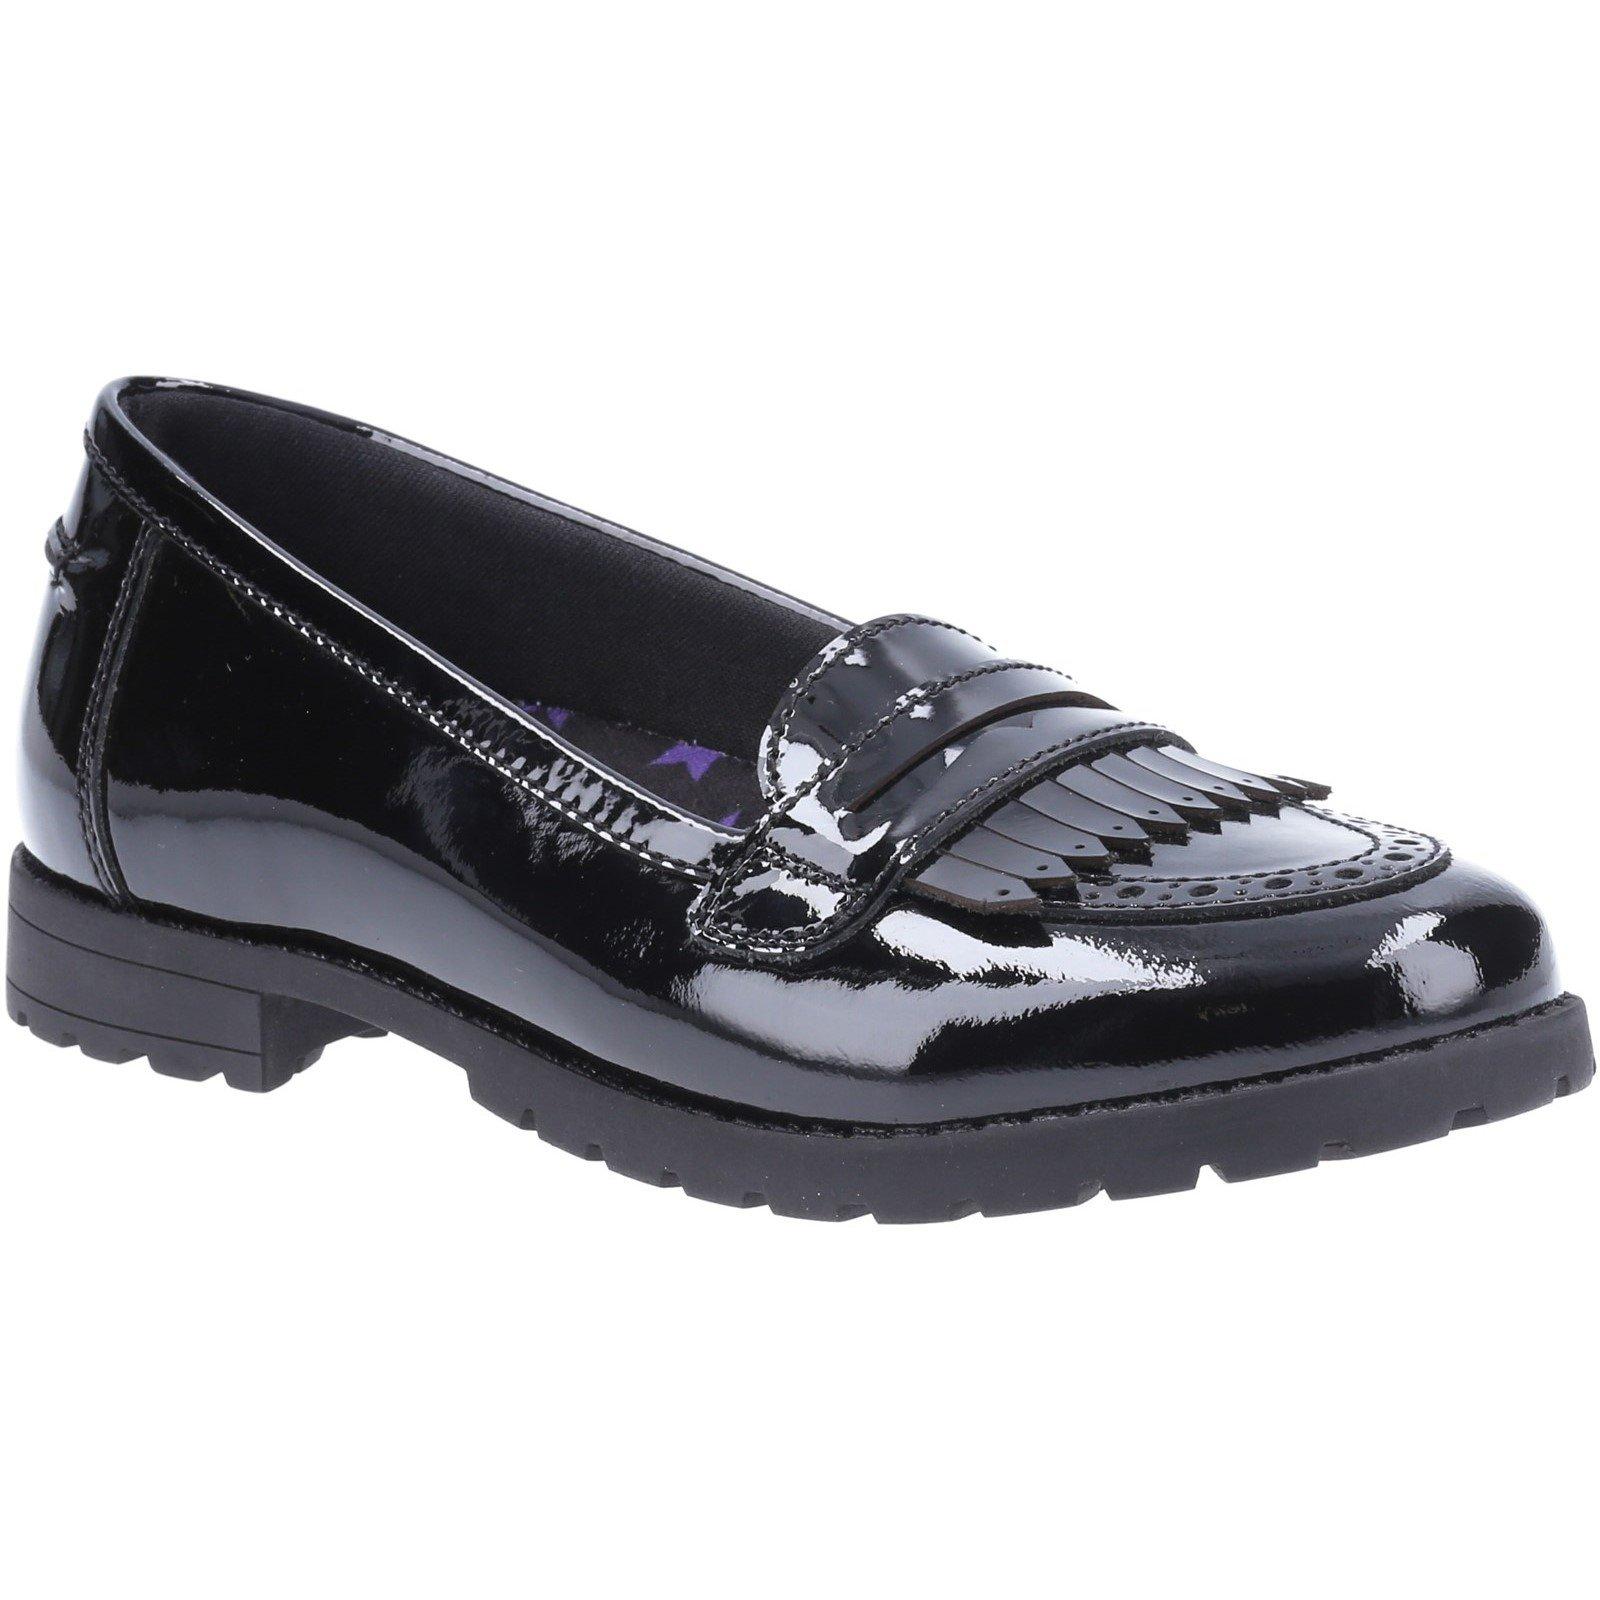 Hush Puppies Kid's Emer Senior School Shoe Patent Black 32596 - Patent Black 8